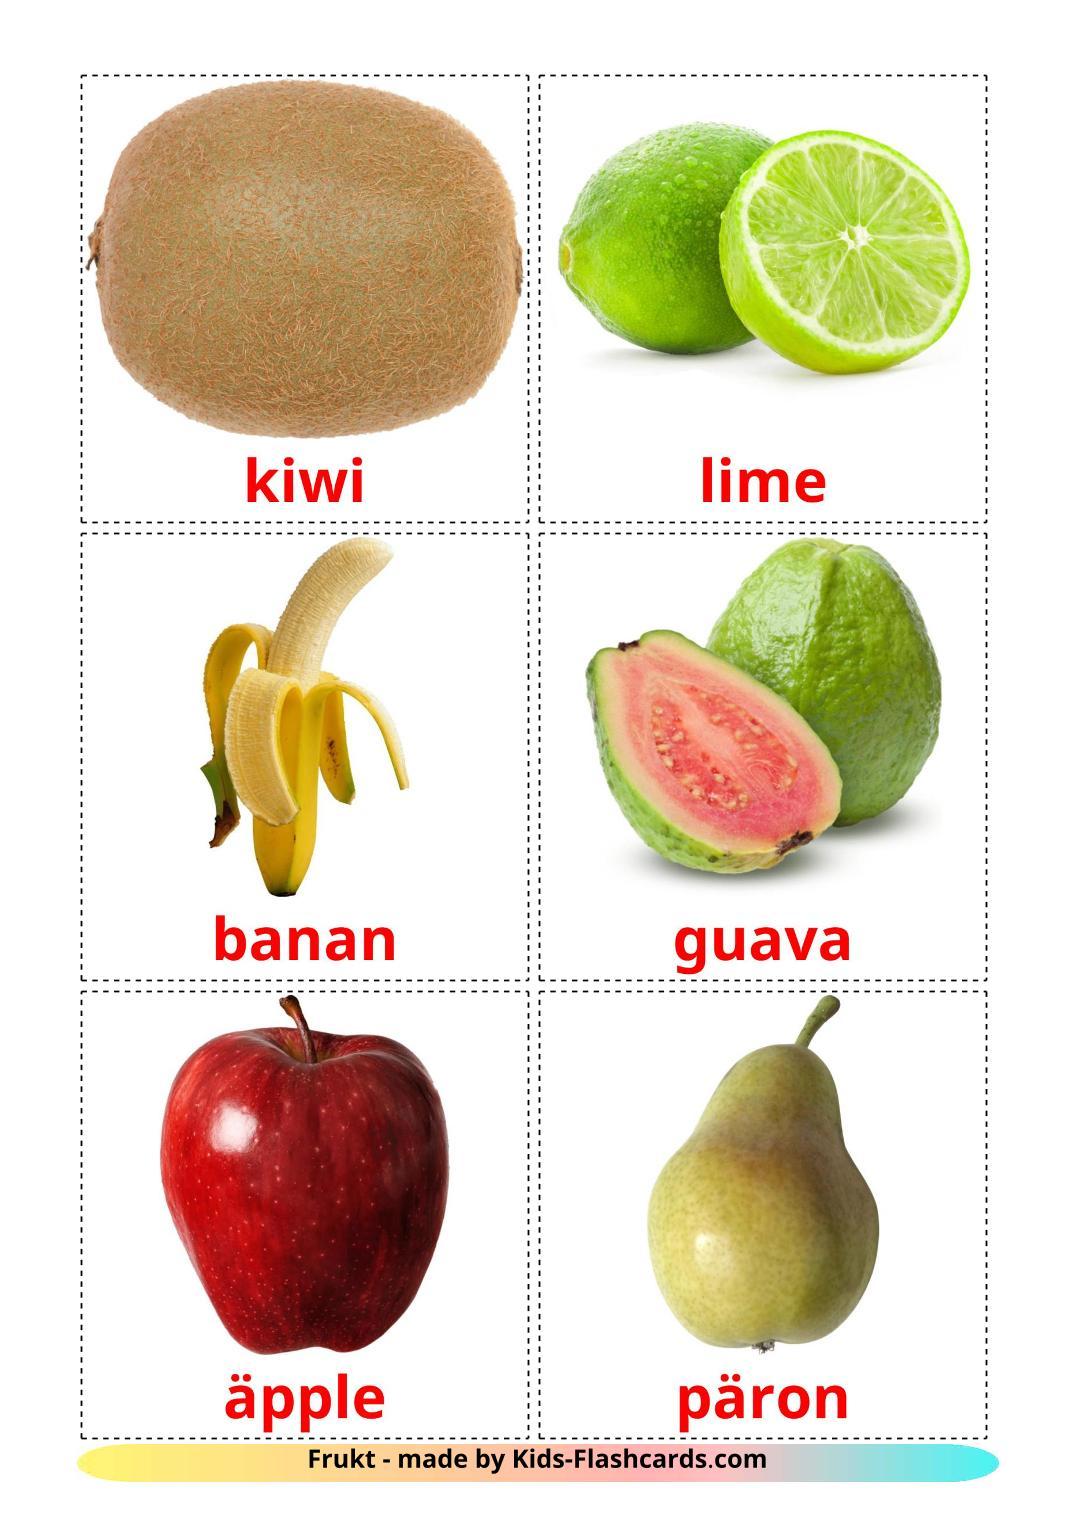 Fruits - 20 Free Printable swedish Flashcards